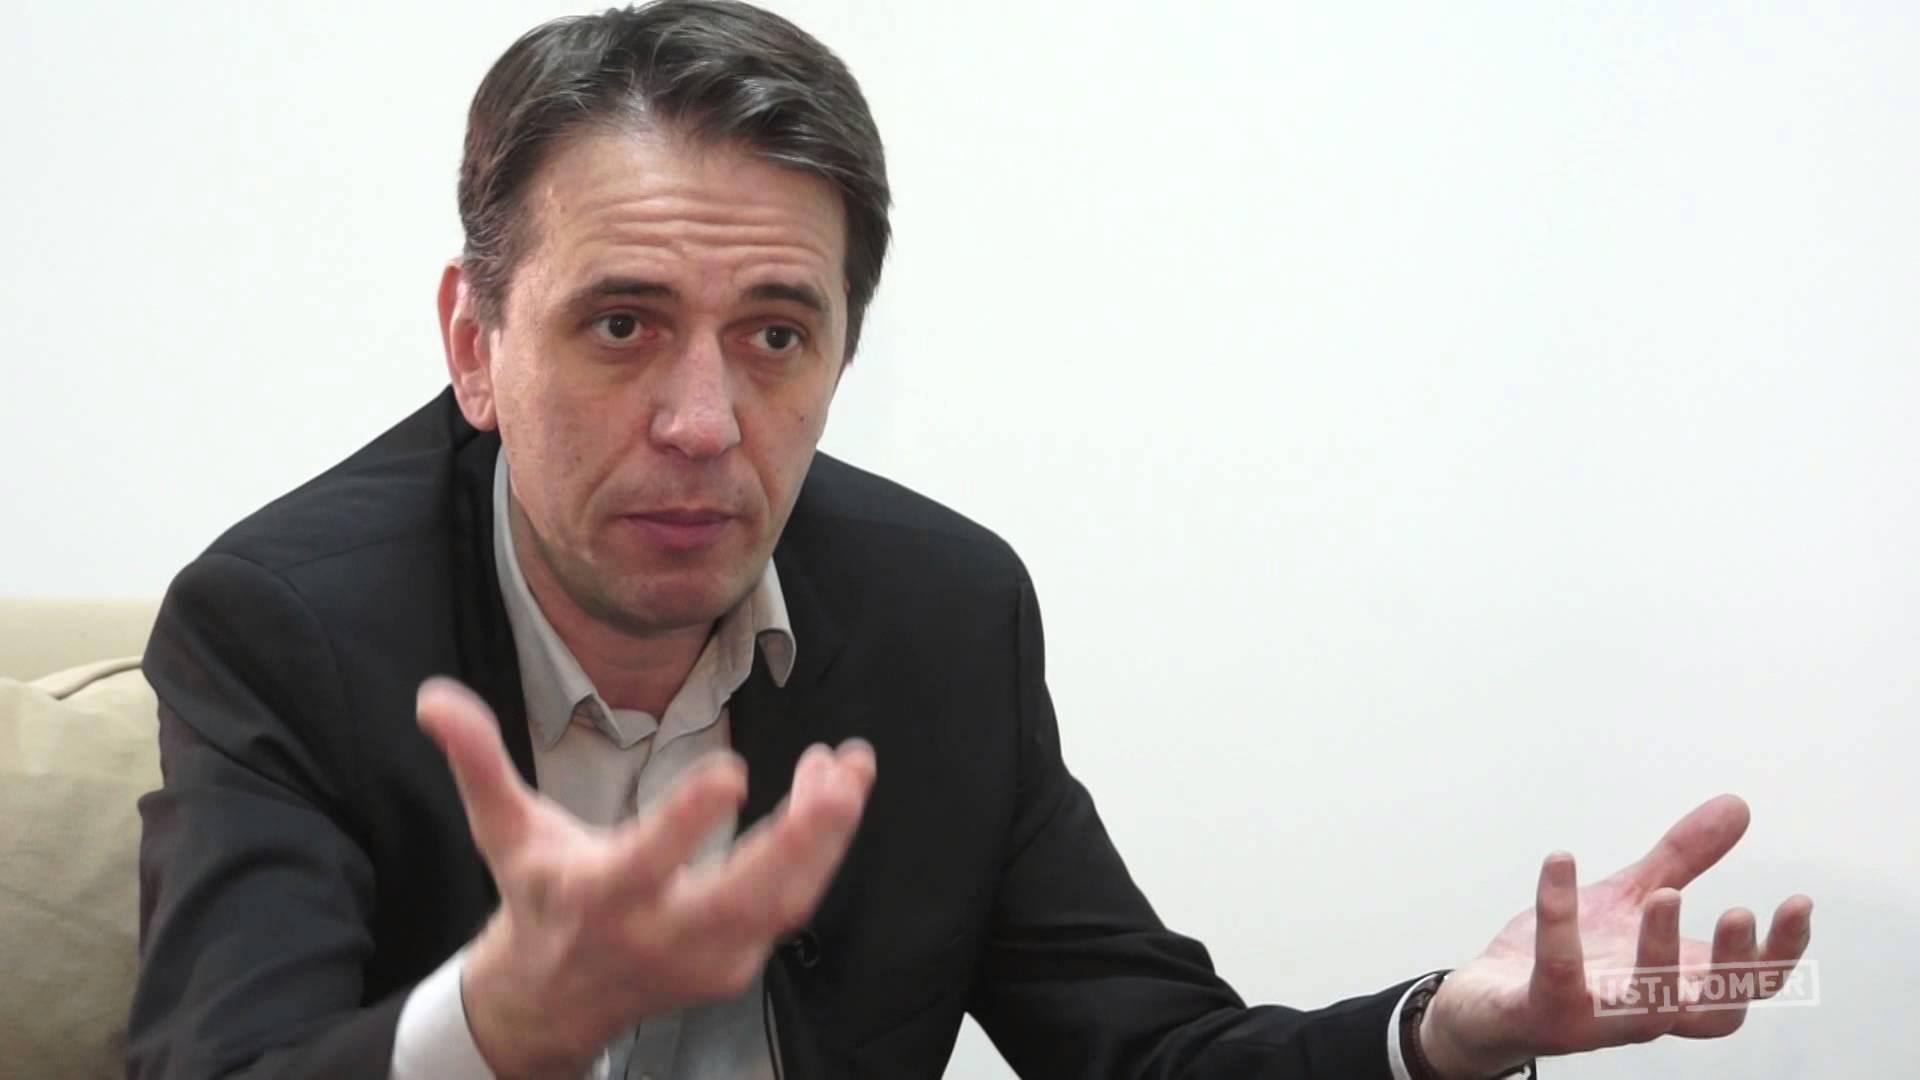 DJB: Sraman poziv RTS-a Saši Raduloviću u emisiju Upitnik